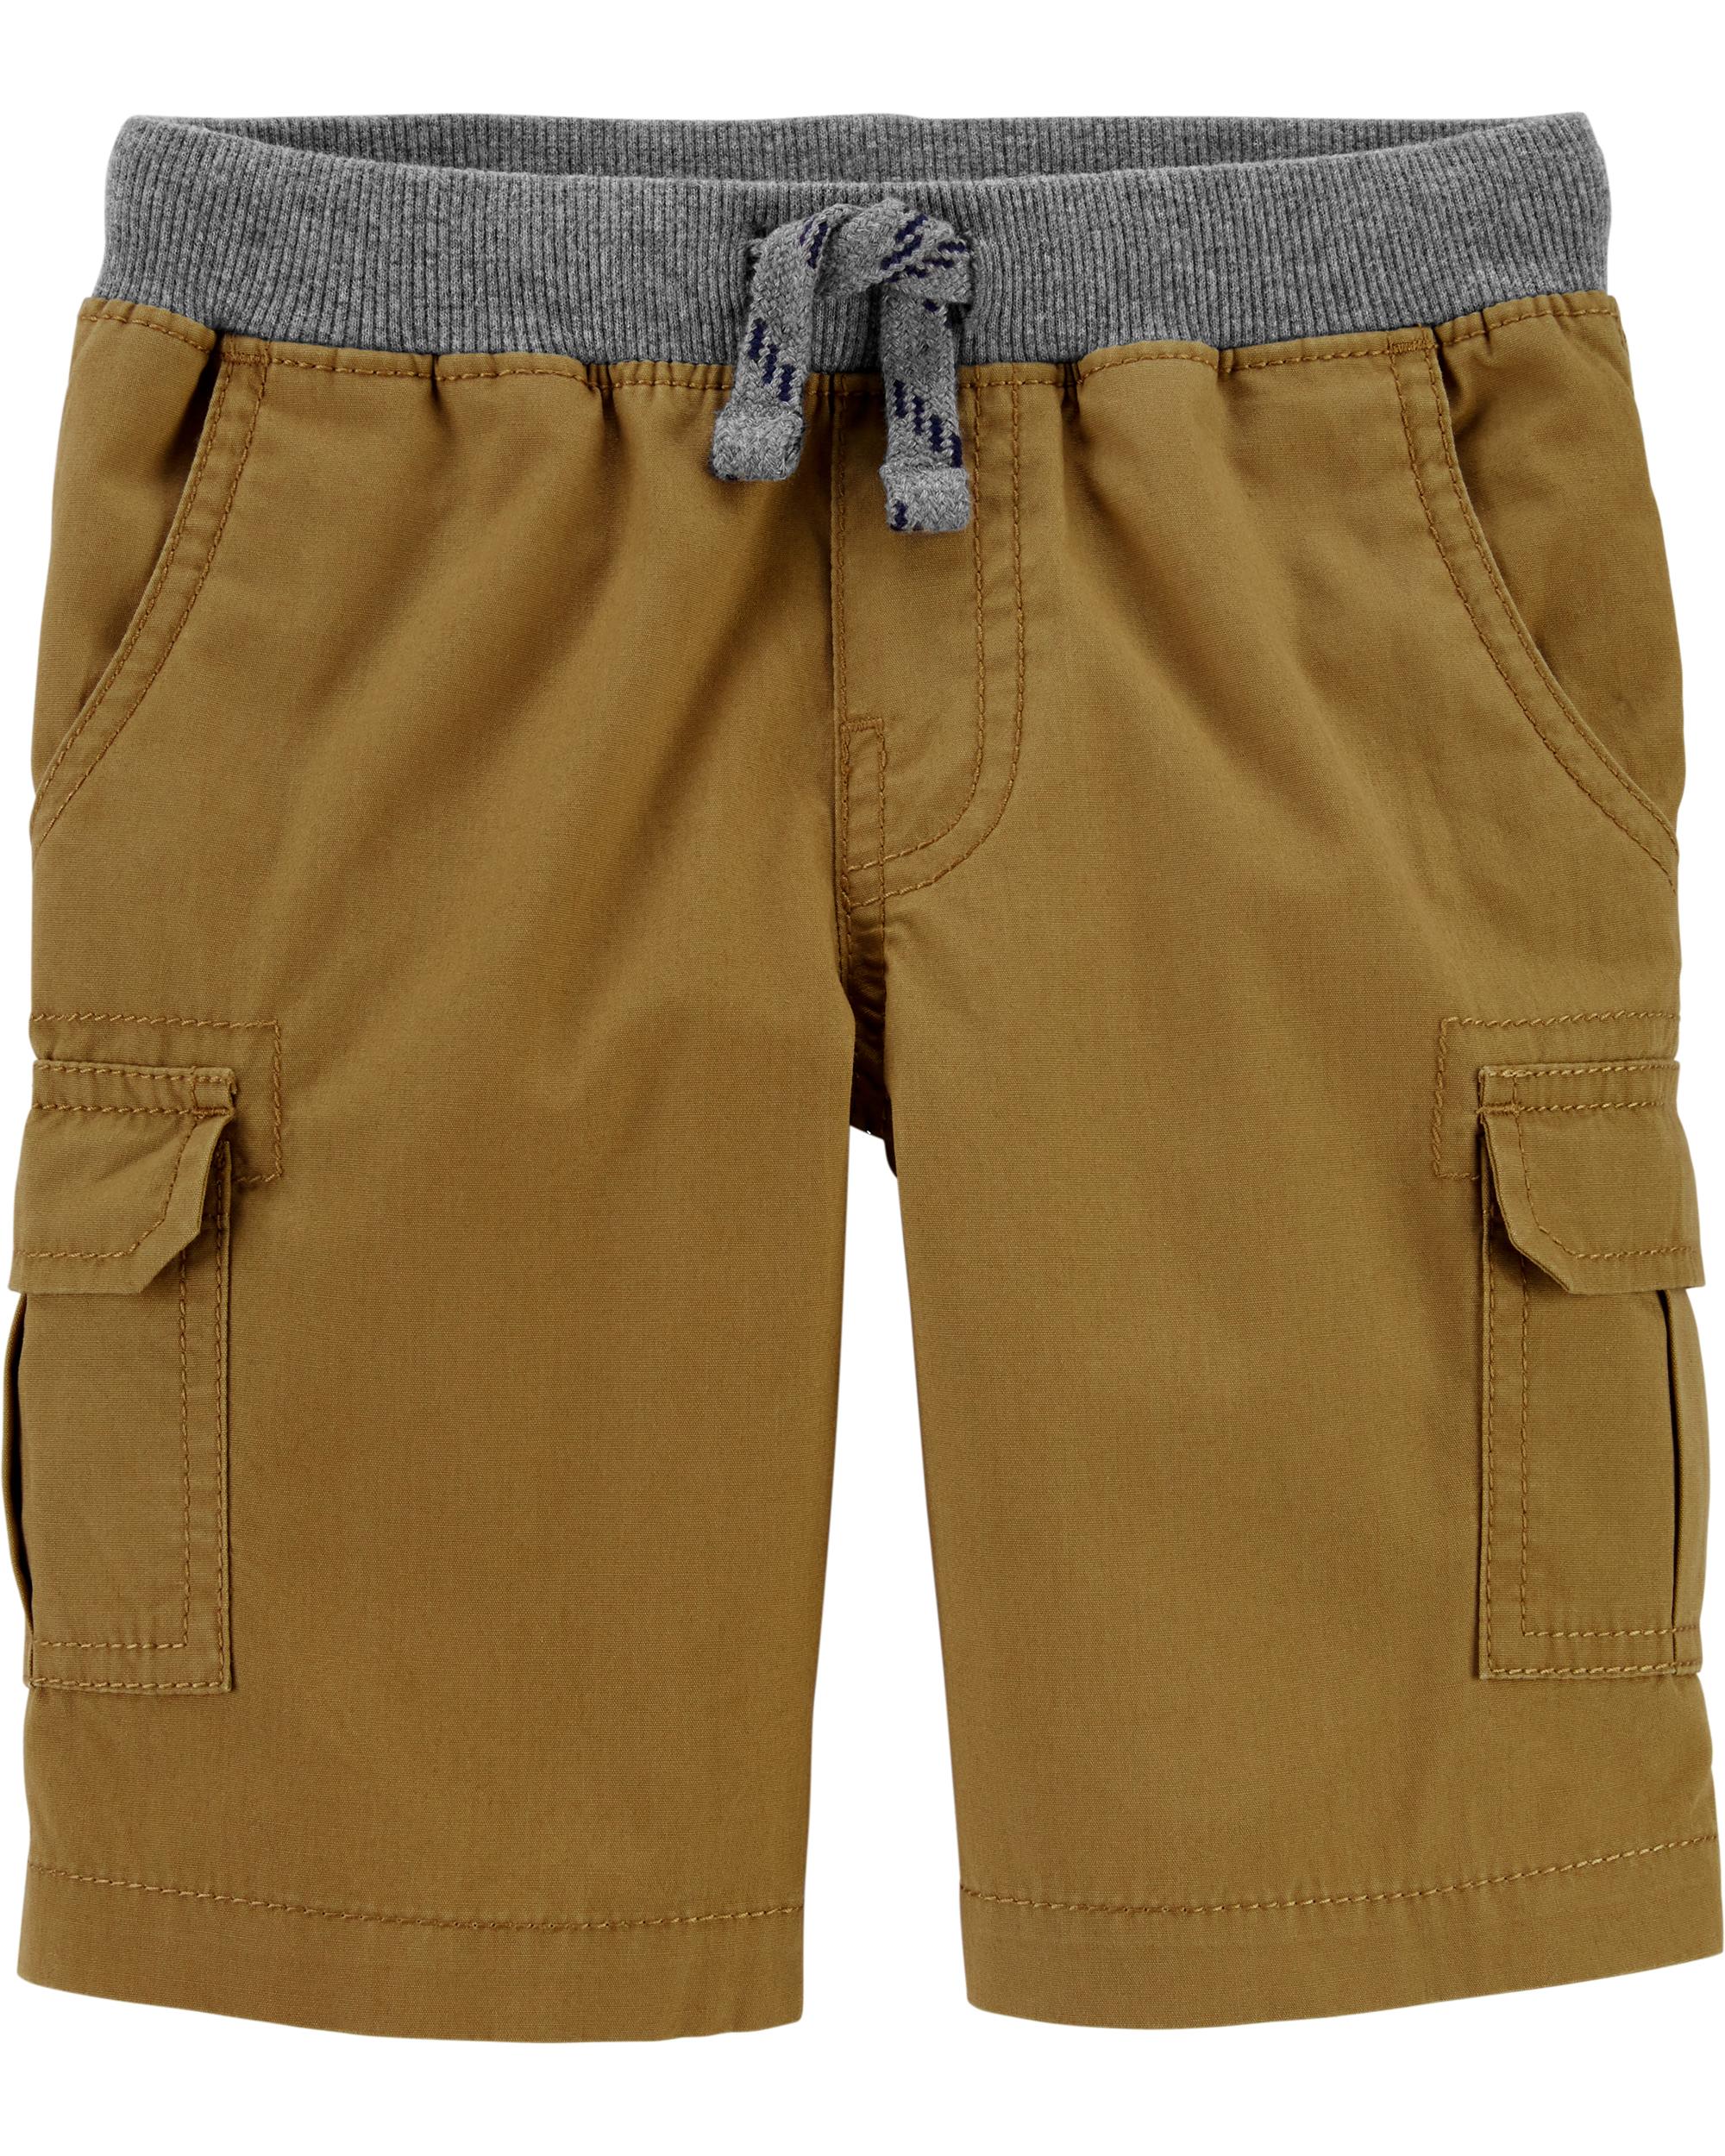 מכנס חאקי כיסים